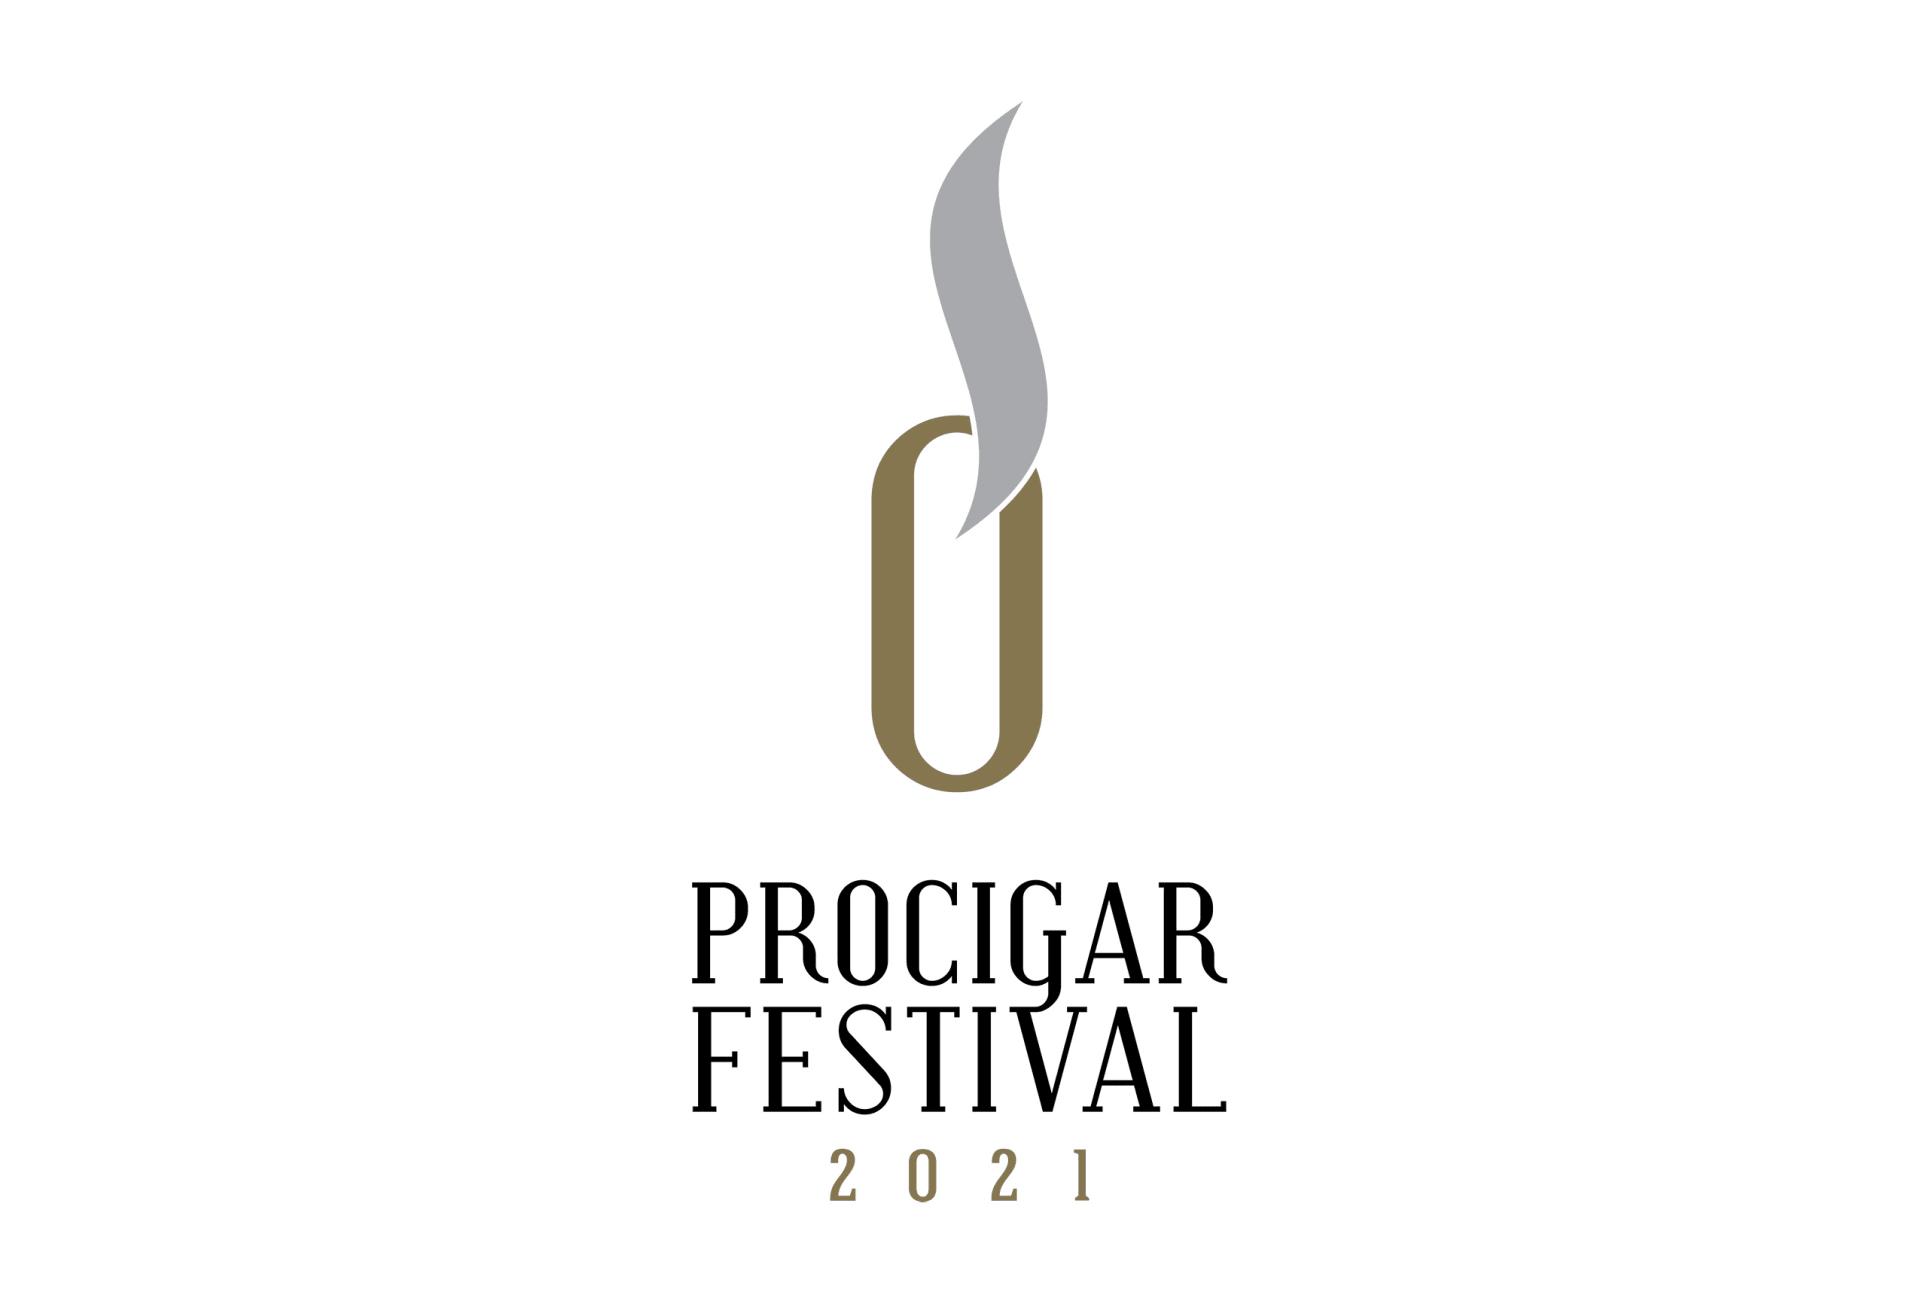 Procigar Festival 2021 Postponed Featured Image